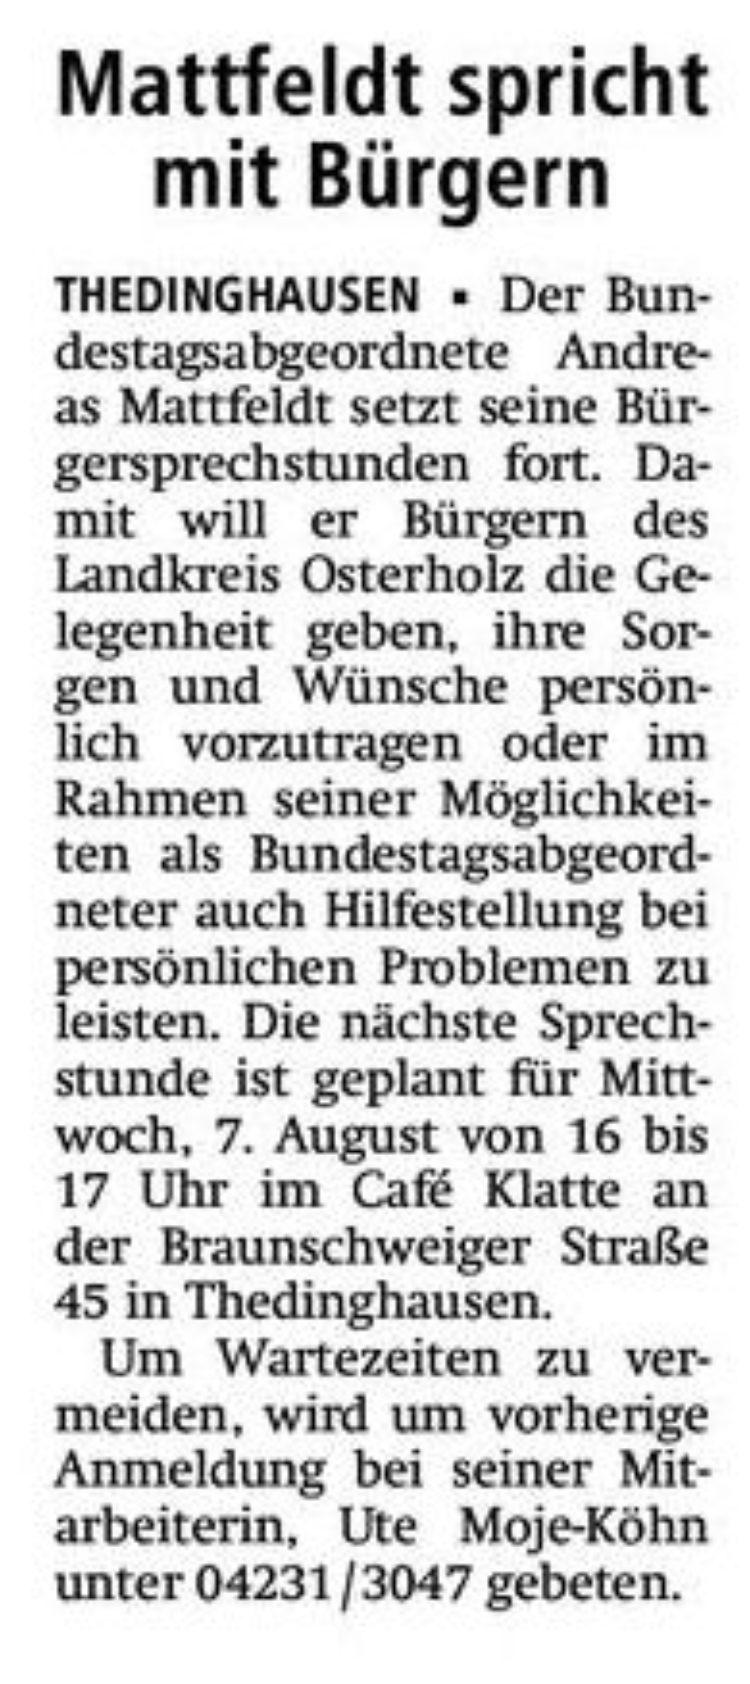 Bürgersprechstunde in Thedinghausen